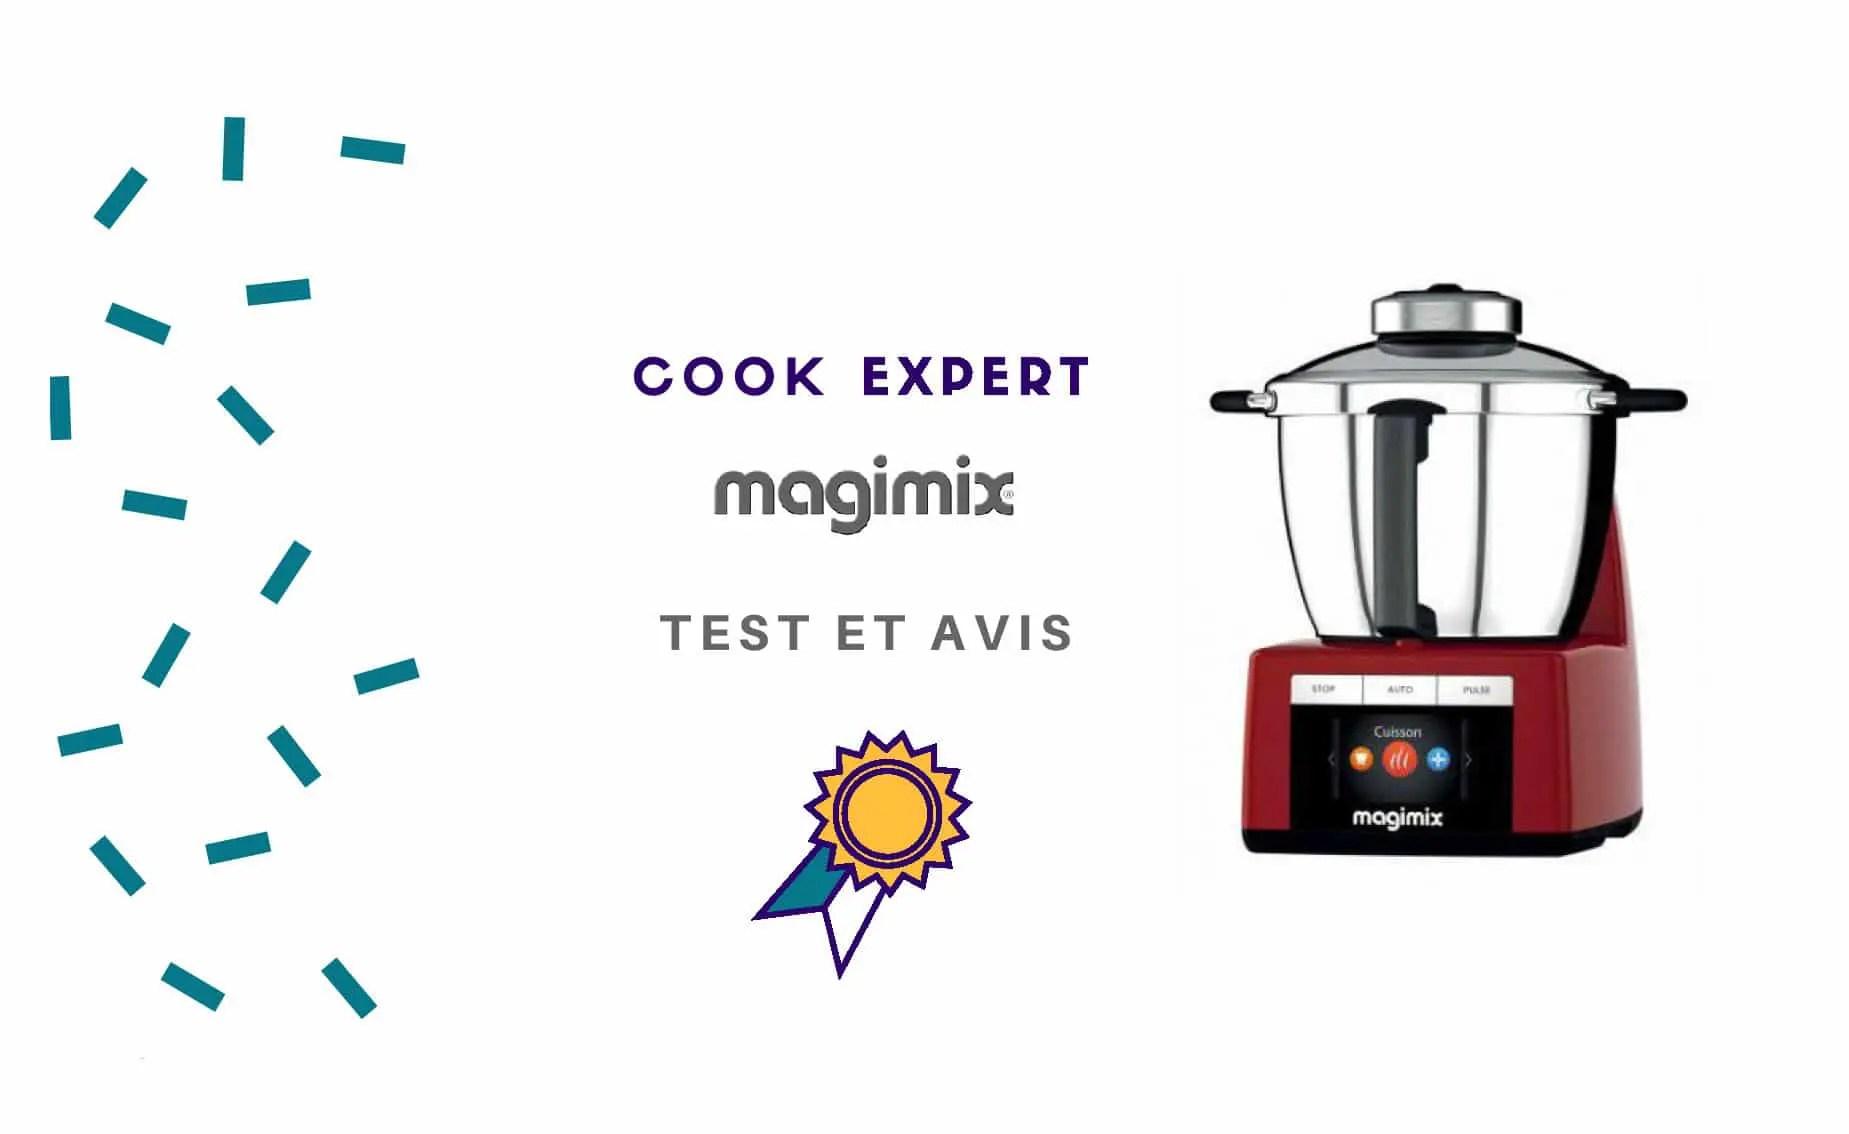 avis magimix cook expert vrai test complet et promo 2021